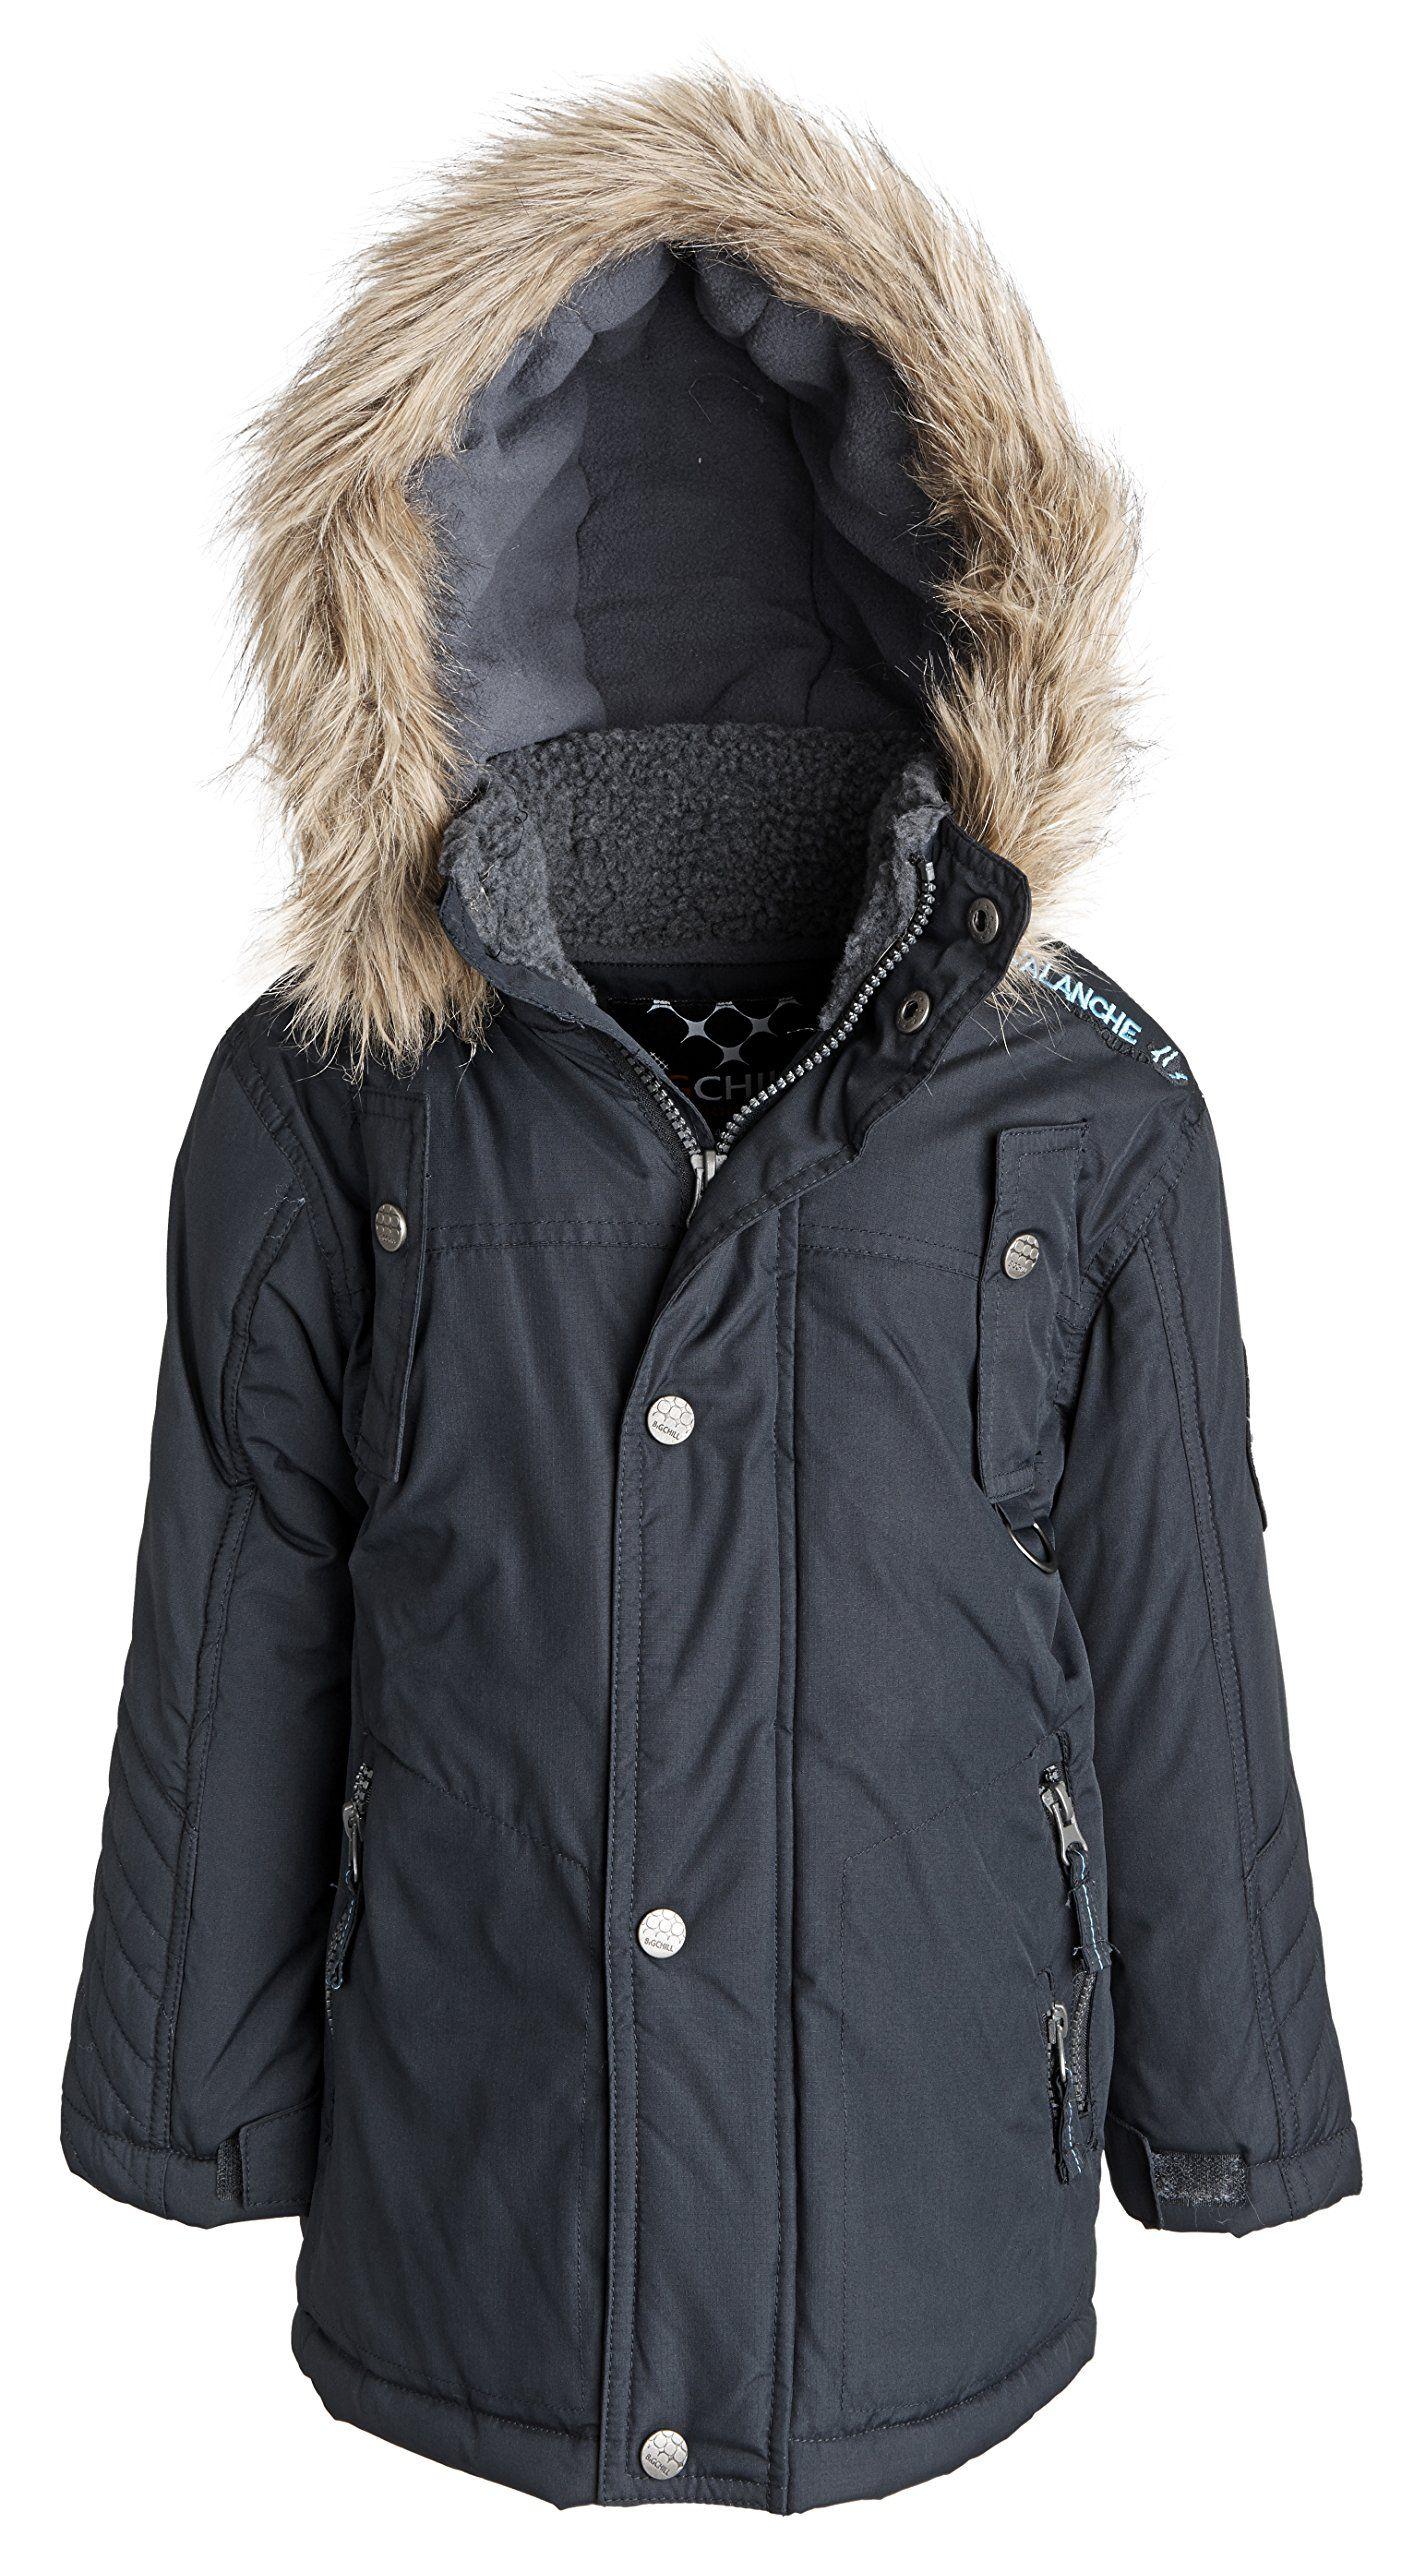 Big Chill Boys Insulated Down Alternative Fleece Lined Puffer Jacket Black 5 Thick Fleece Interior Lining Insulating Ad Puffer Jackets Jackets Camo Designs [ 2560 x 1414 Pixel ]